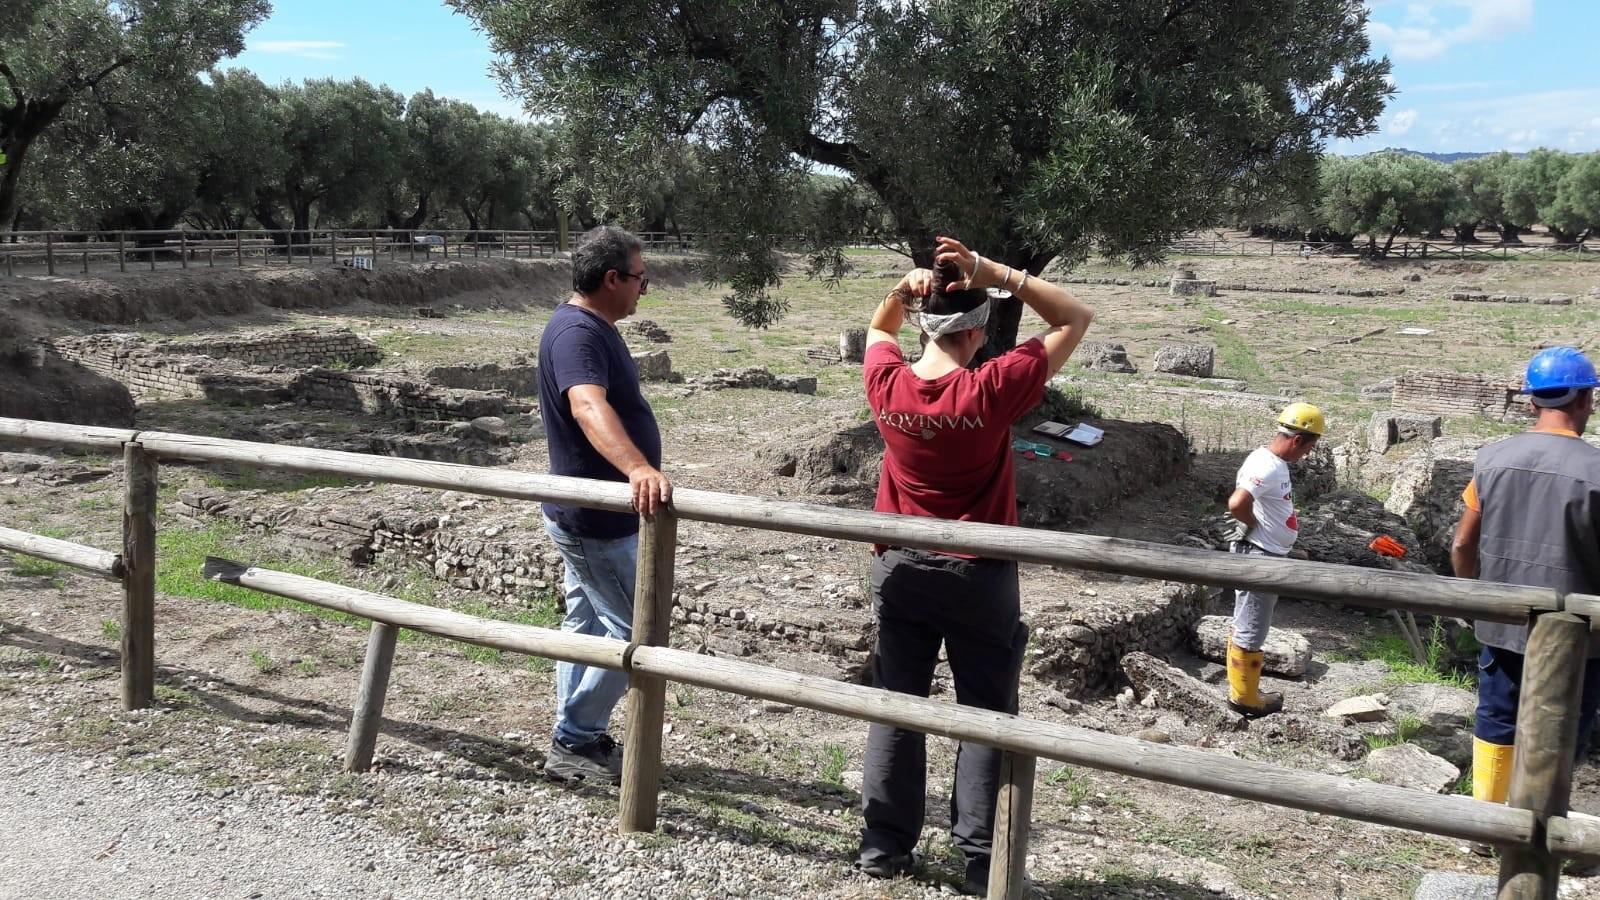 Intervento nel Parco Archeologico Scolacium f471052c 7728 45d6 bcf4 d1a1bc158216